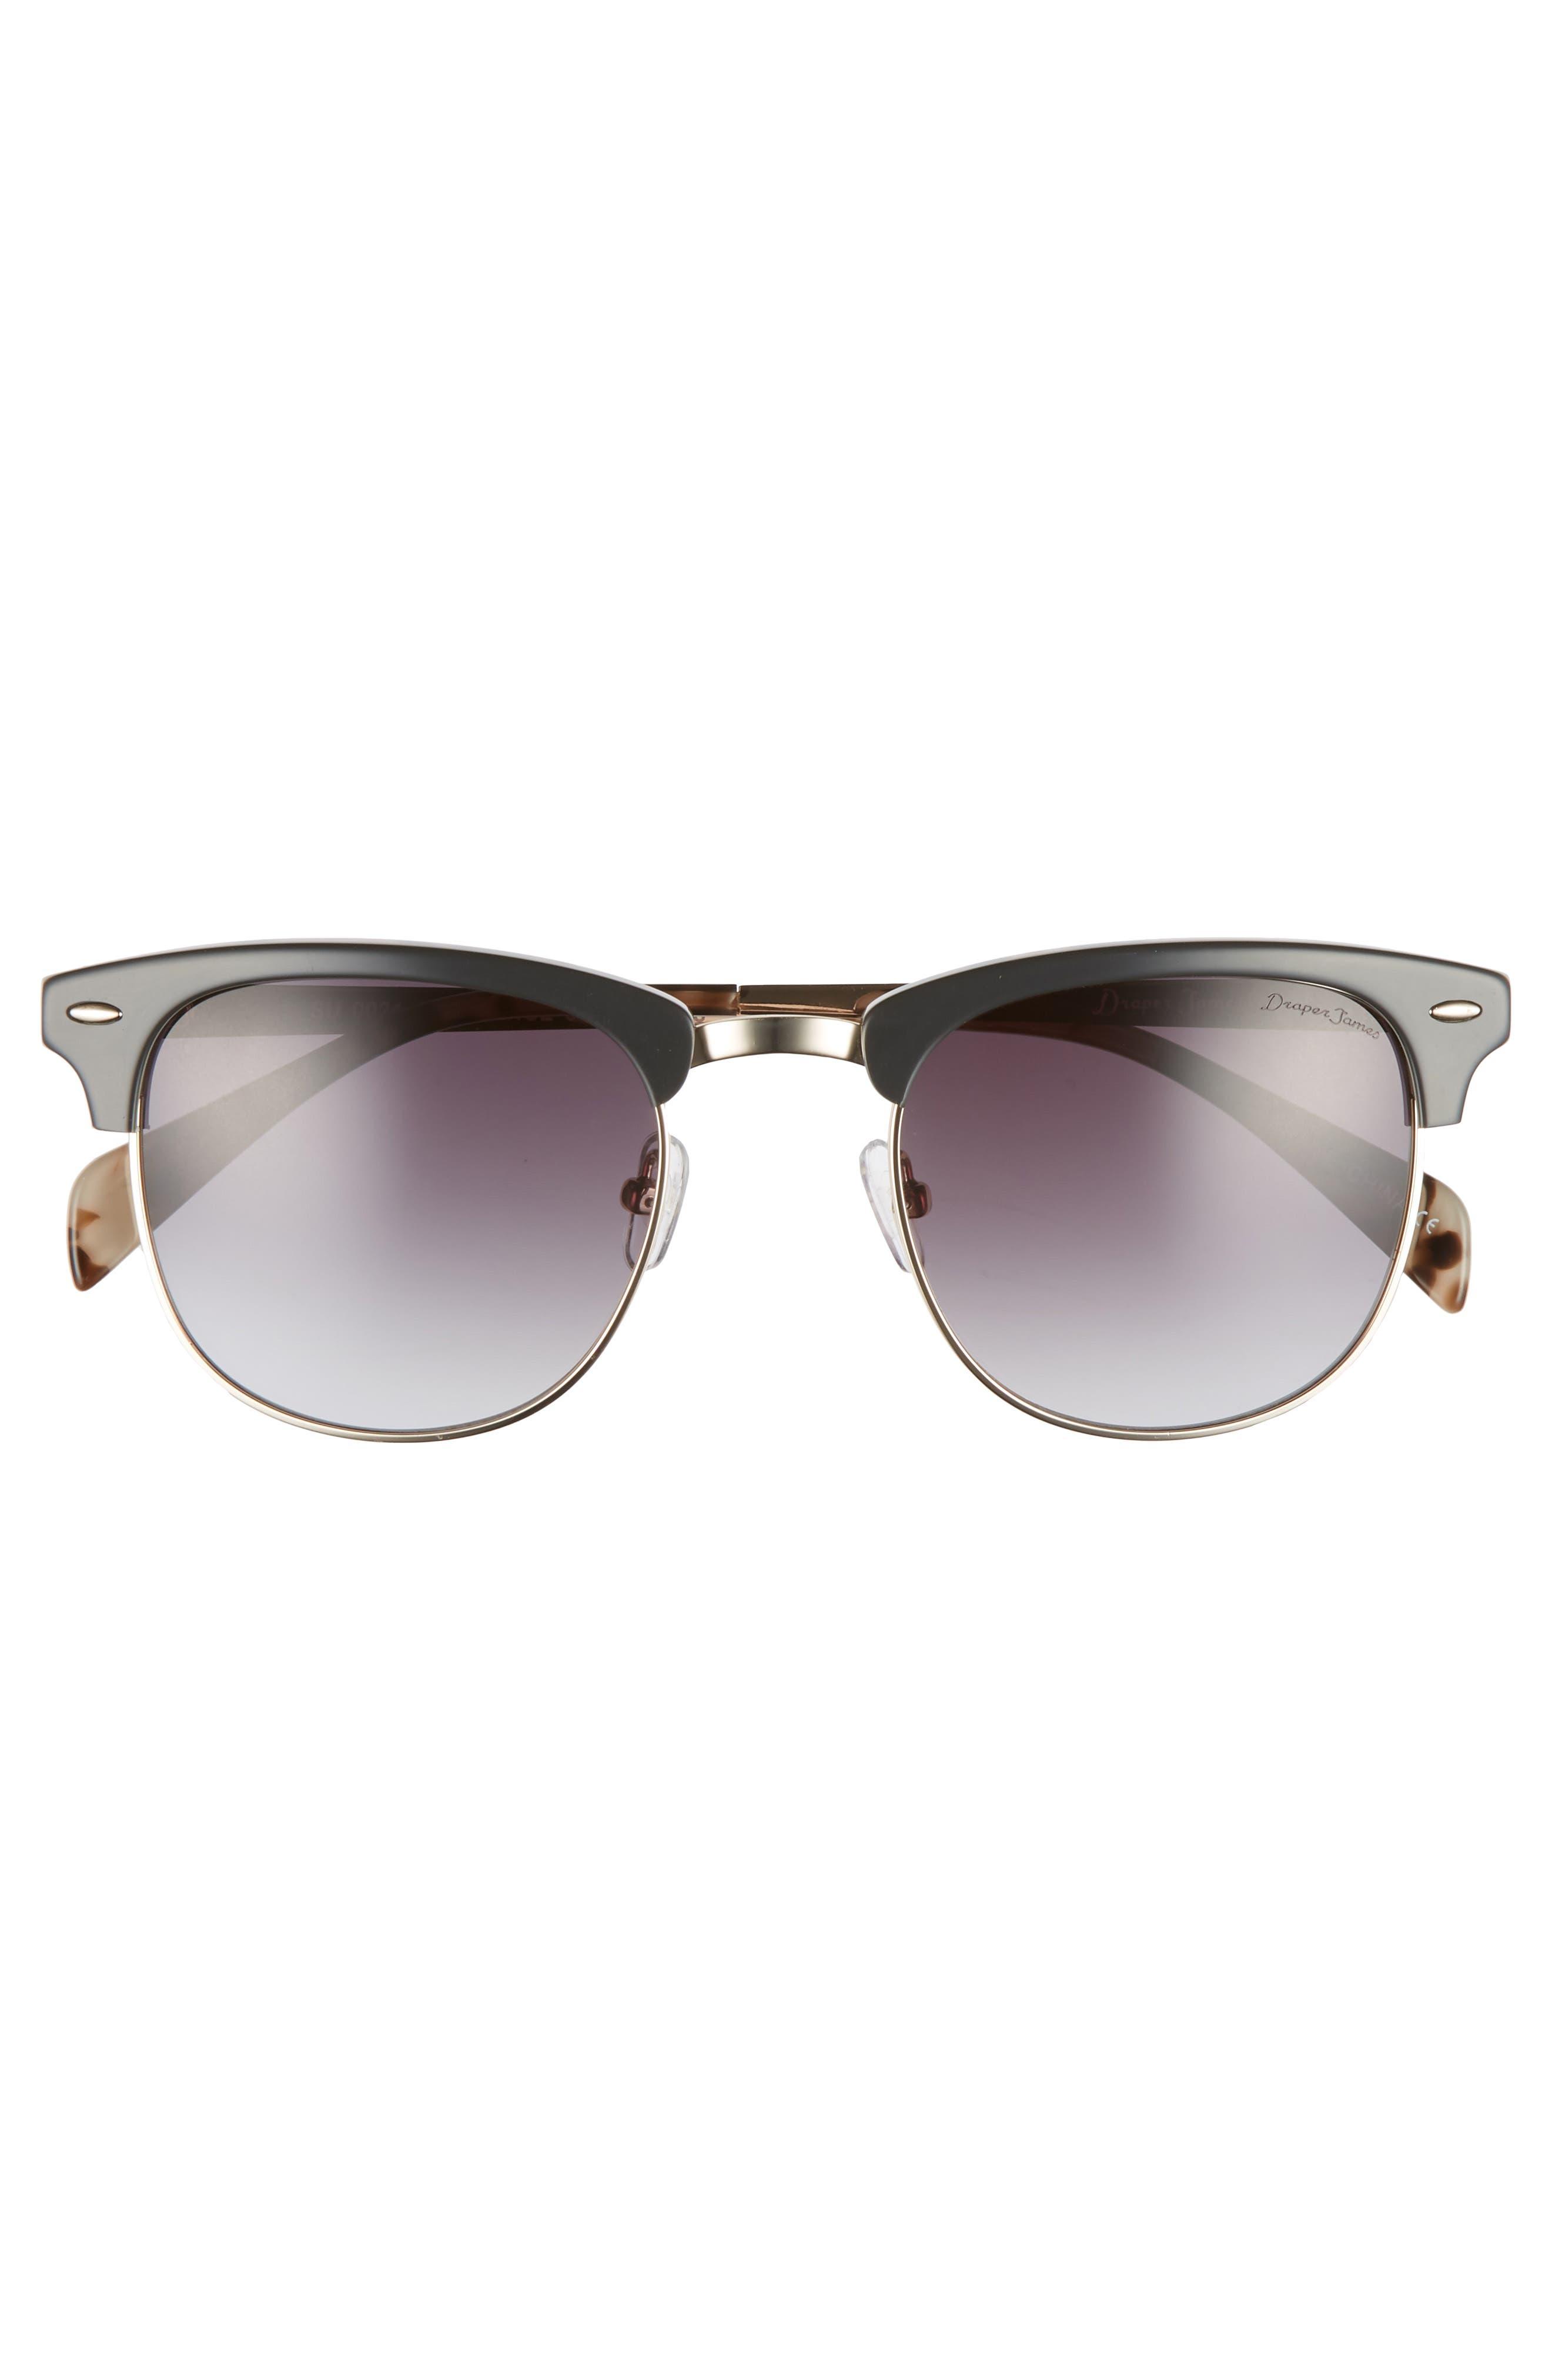 55mm Sunglasses,                             Alternate thumbnail 3, color,                             GREY